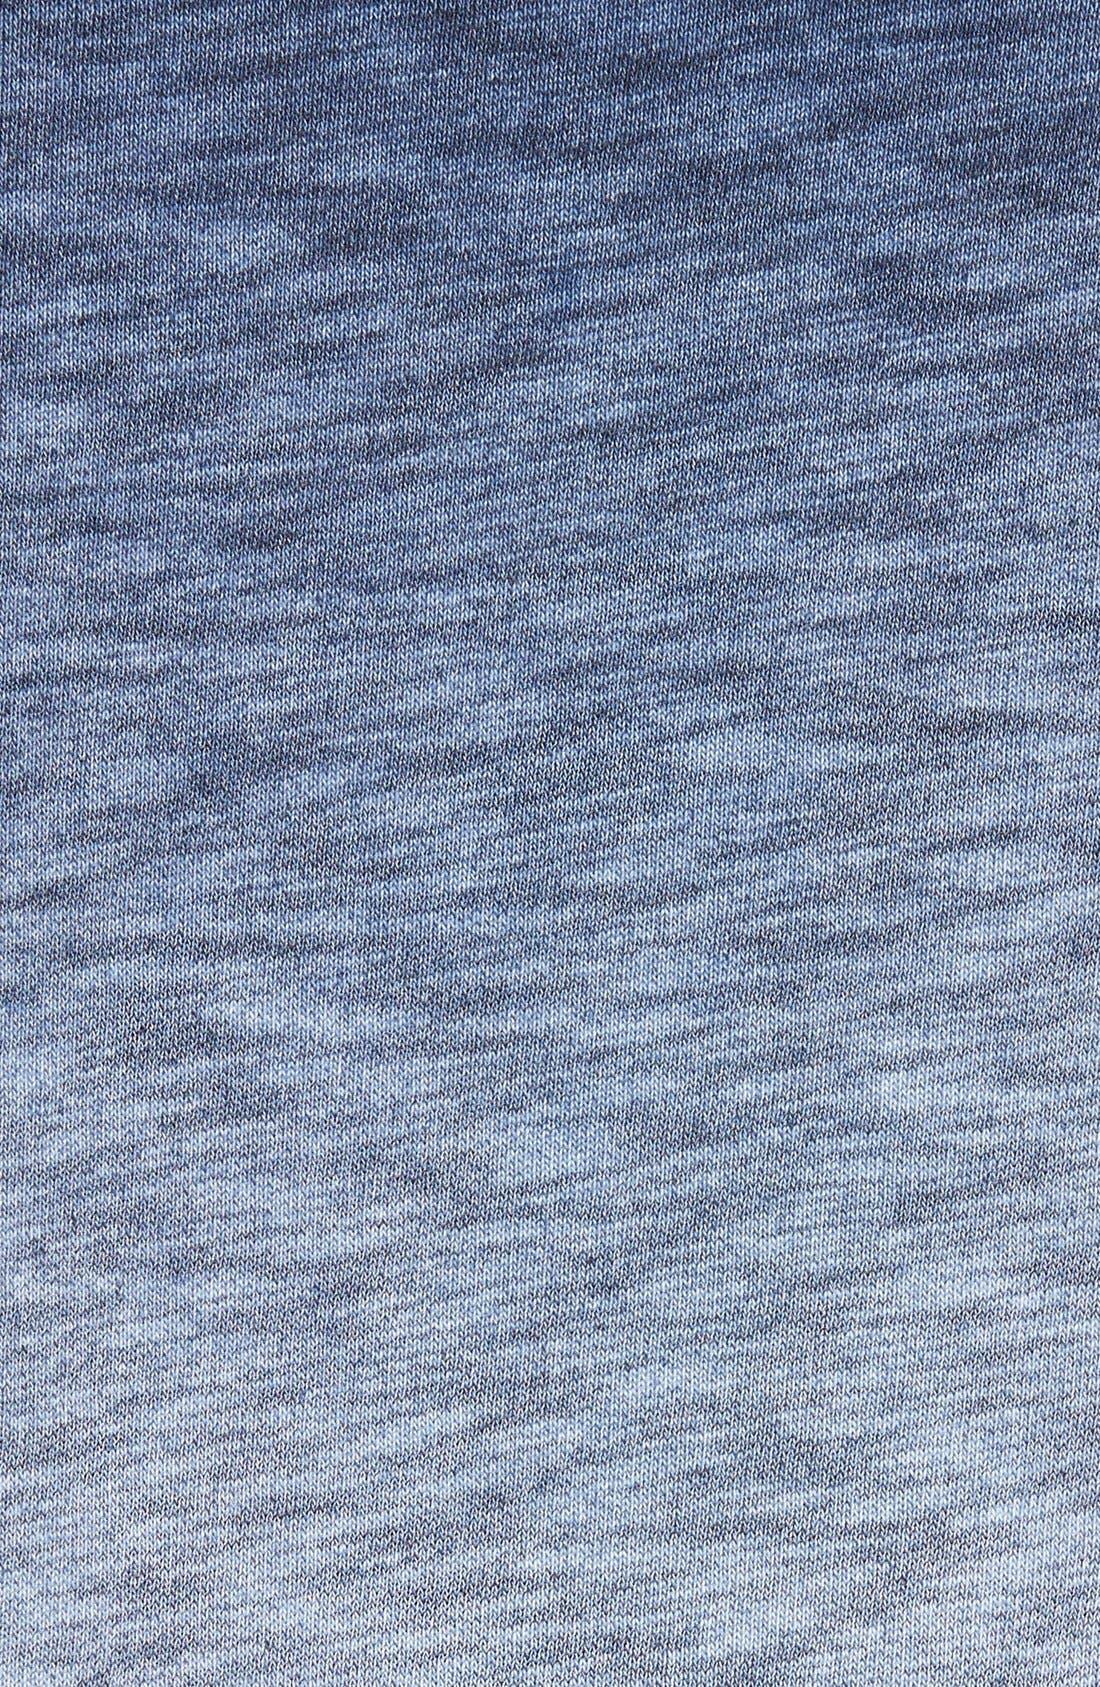 'Santiago' Ombré Crewneck Sweatshirt,                             Alternate thumbnail 5, color,                             Navy